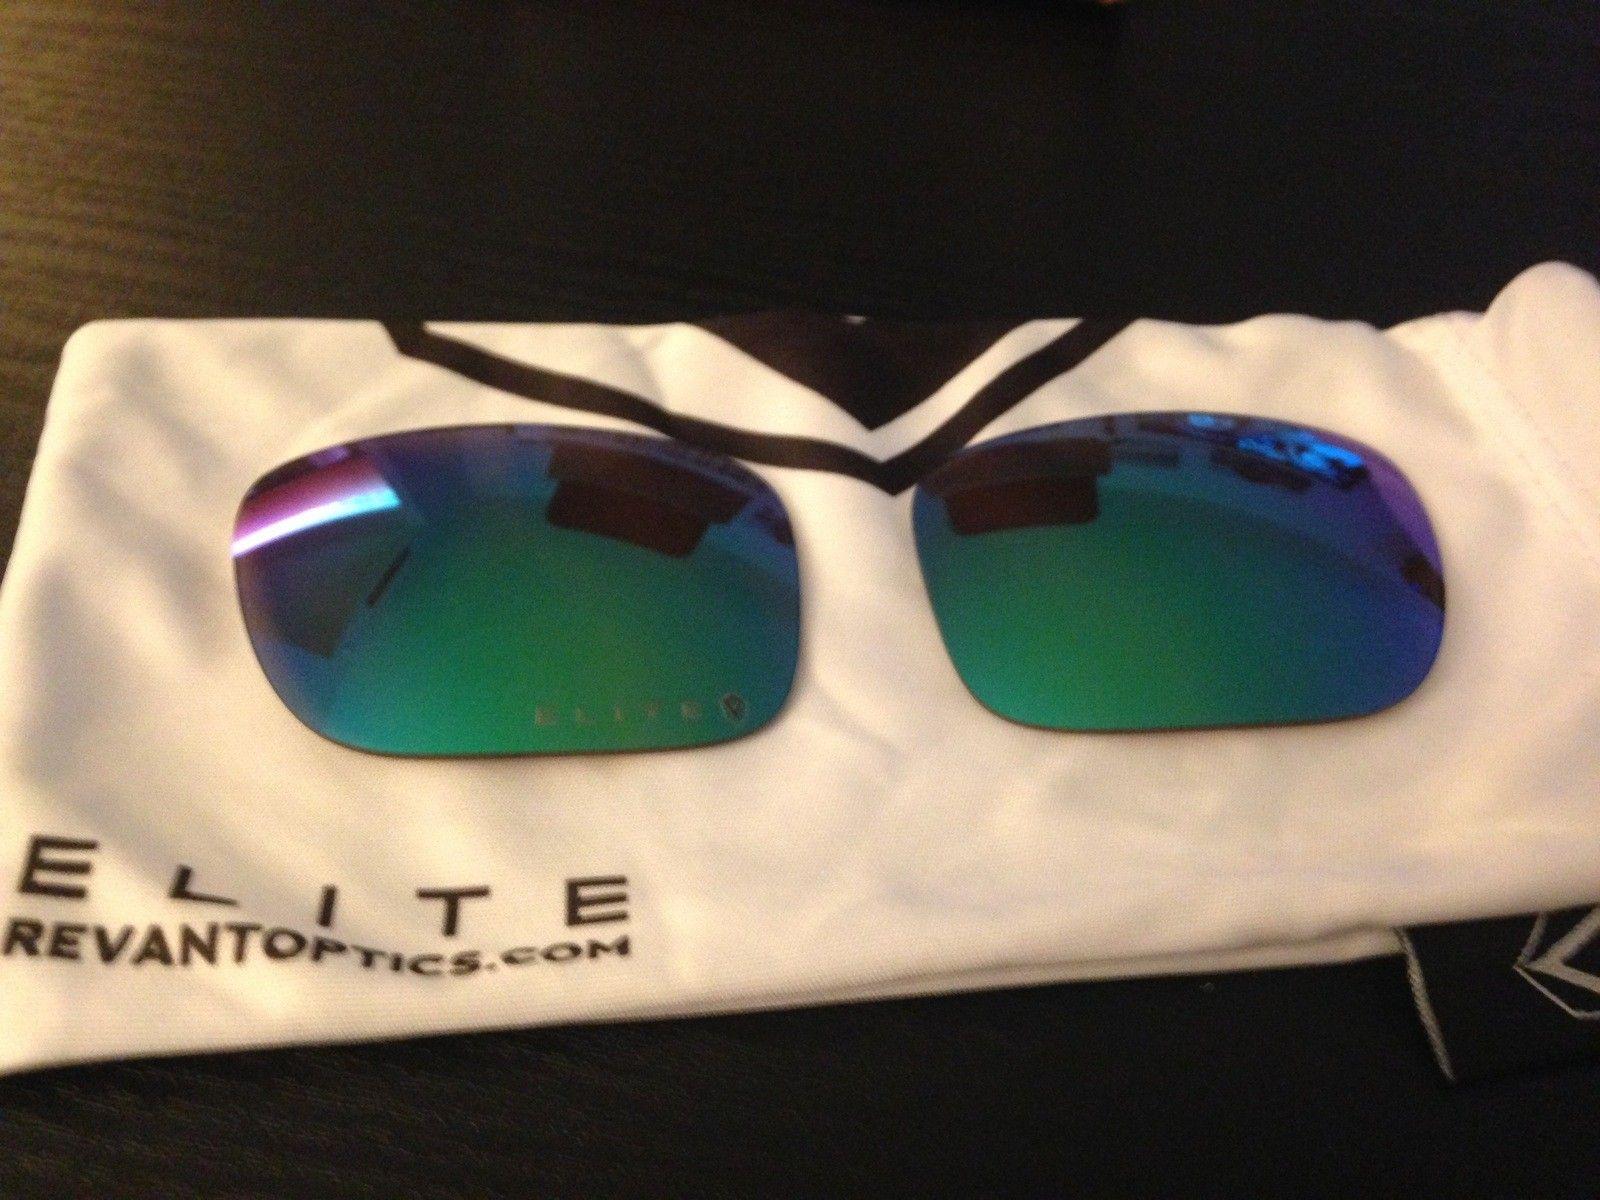 Revant Optics HC3 Elite Mirrorshield Lens Review - IMG_1733.JPG